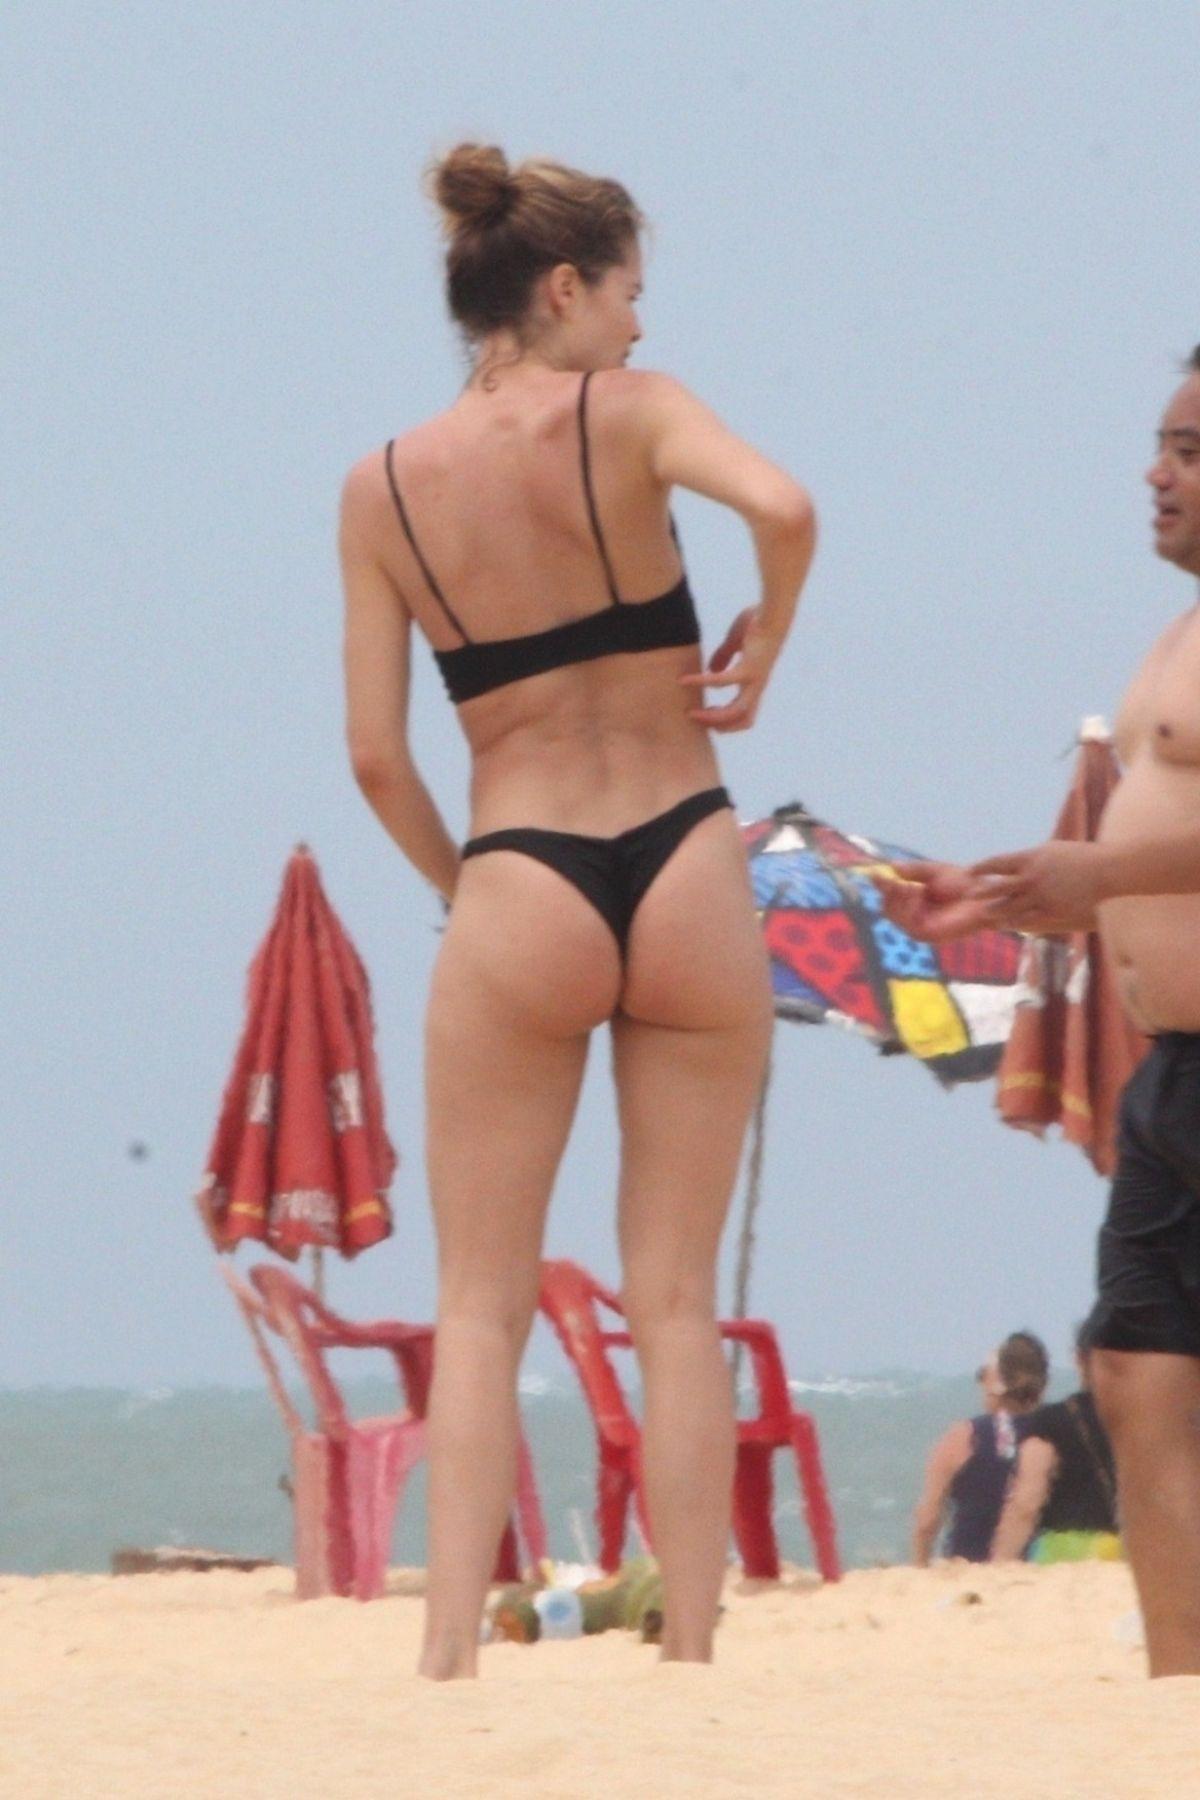 Doutzen Kroes in Bikini on the beach in Bahia Pic 5 of 35